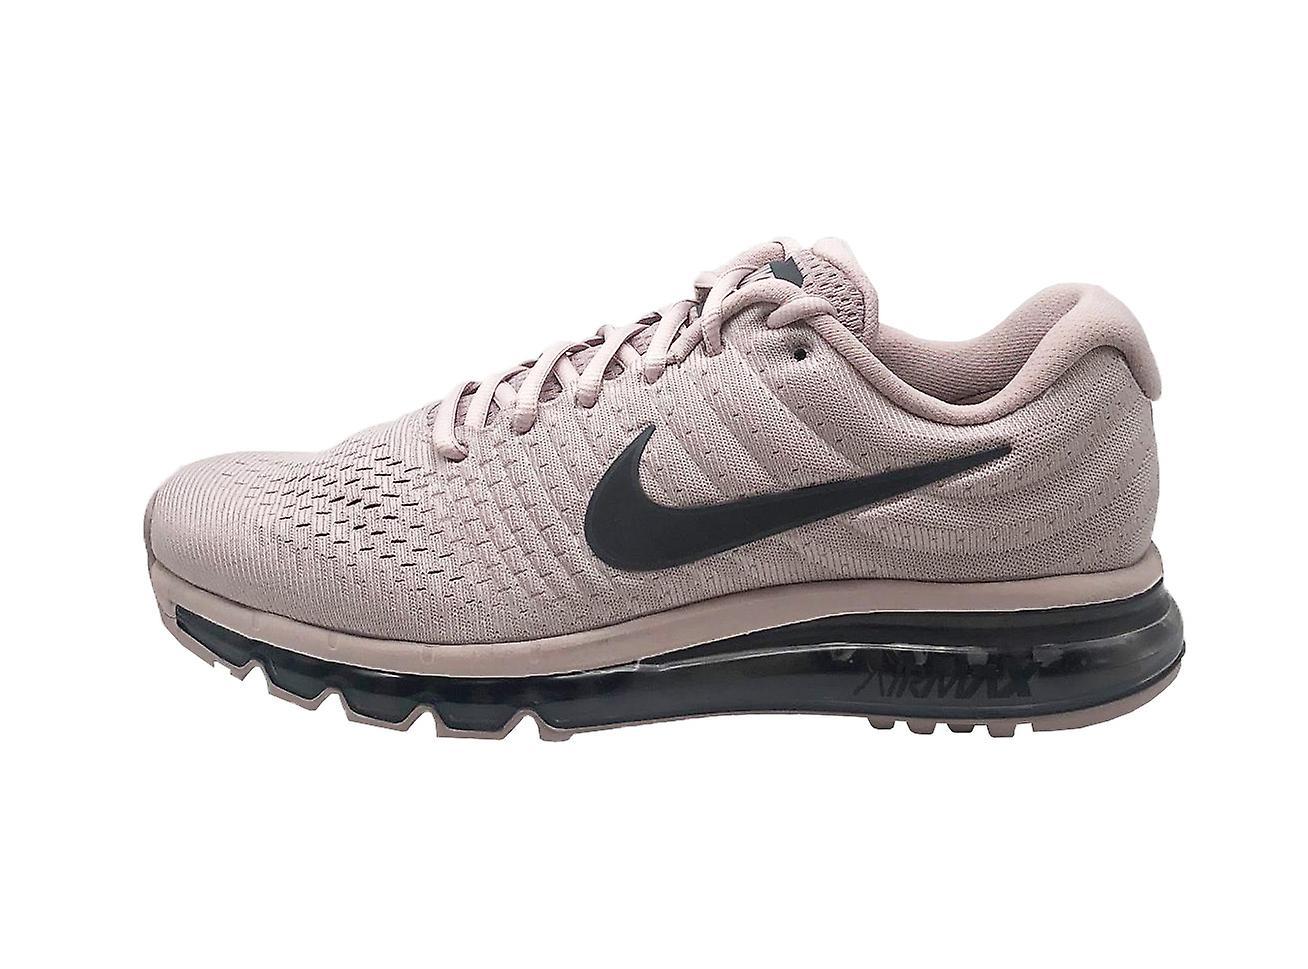 Nike Air Max 2017 AQ8628 600 Mens utbildare